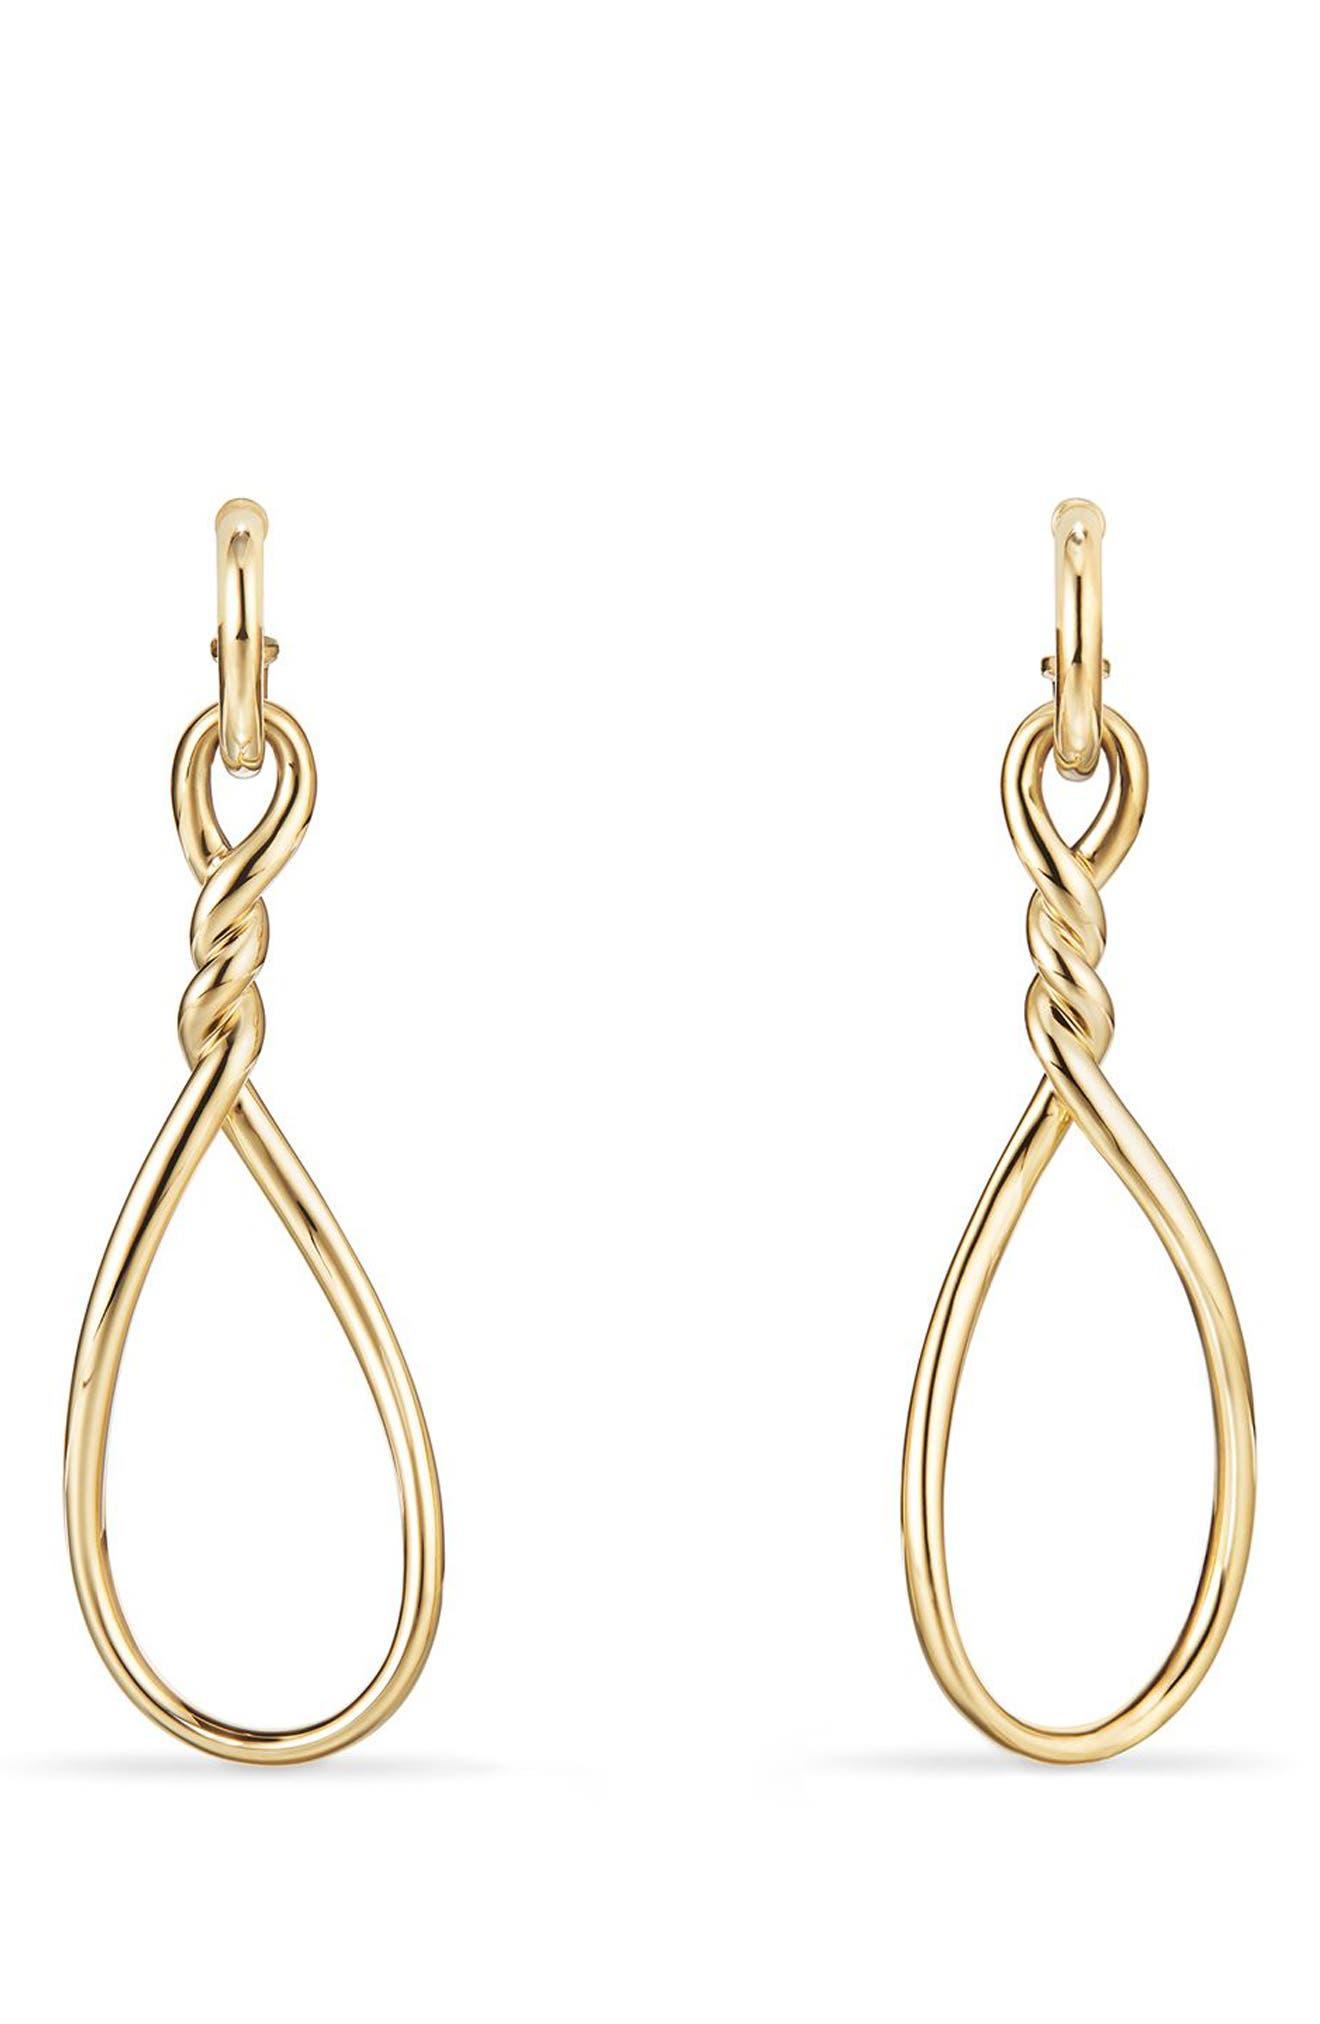 David Yurman Continuance Drop Earrings